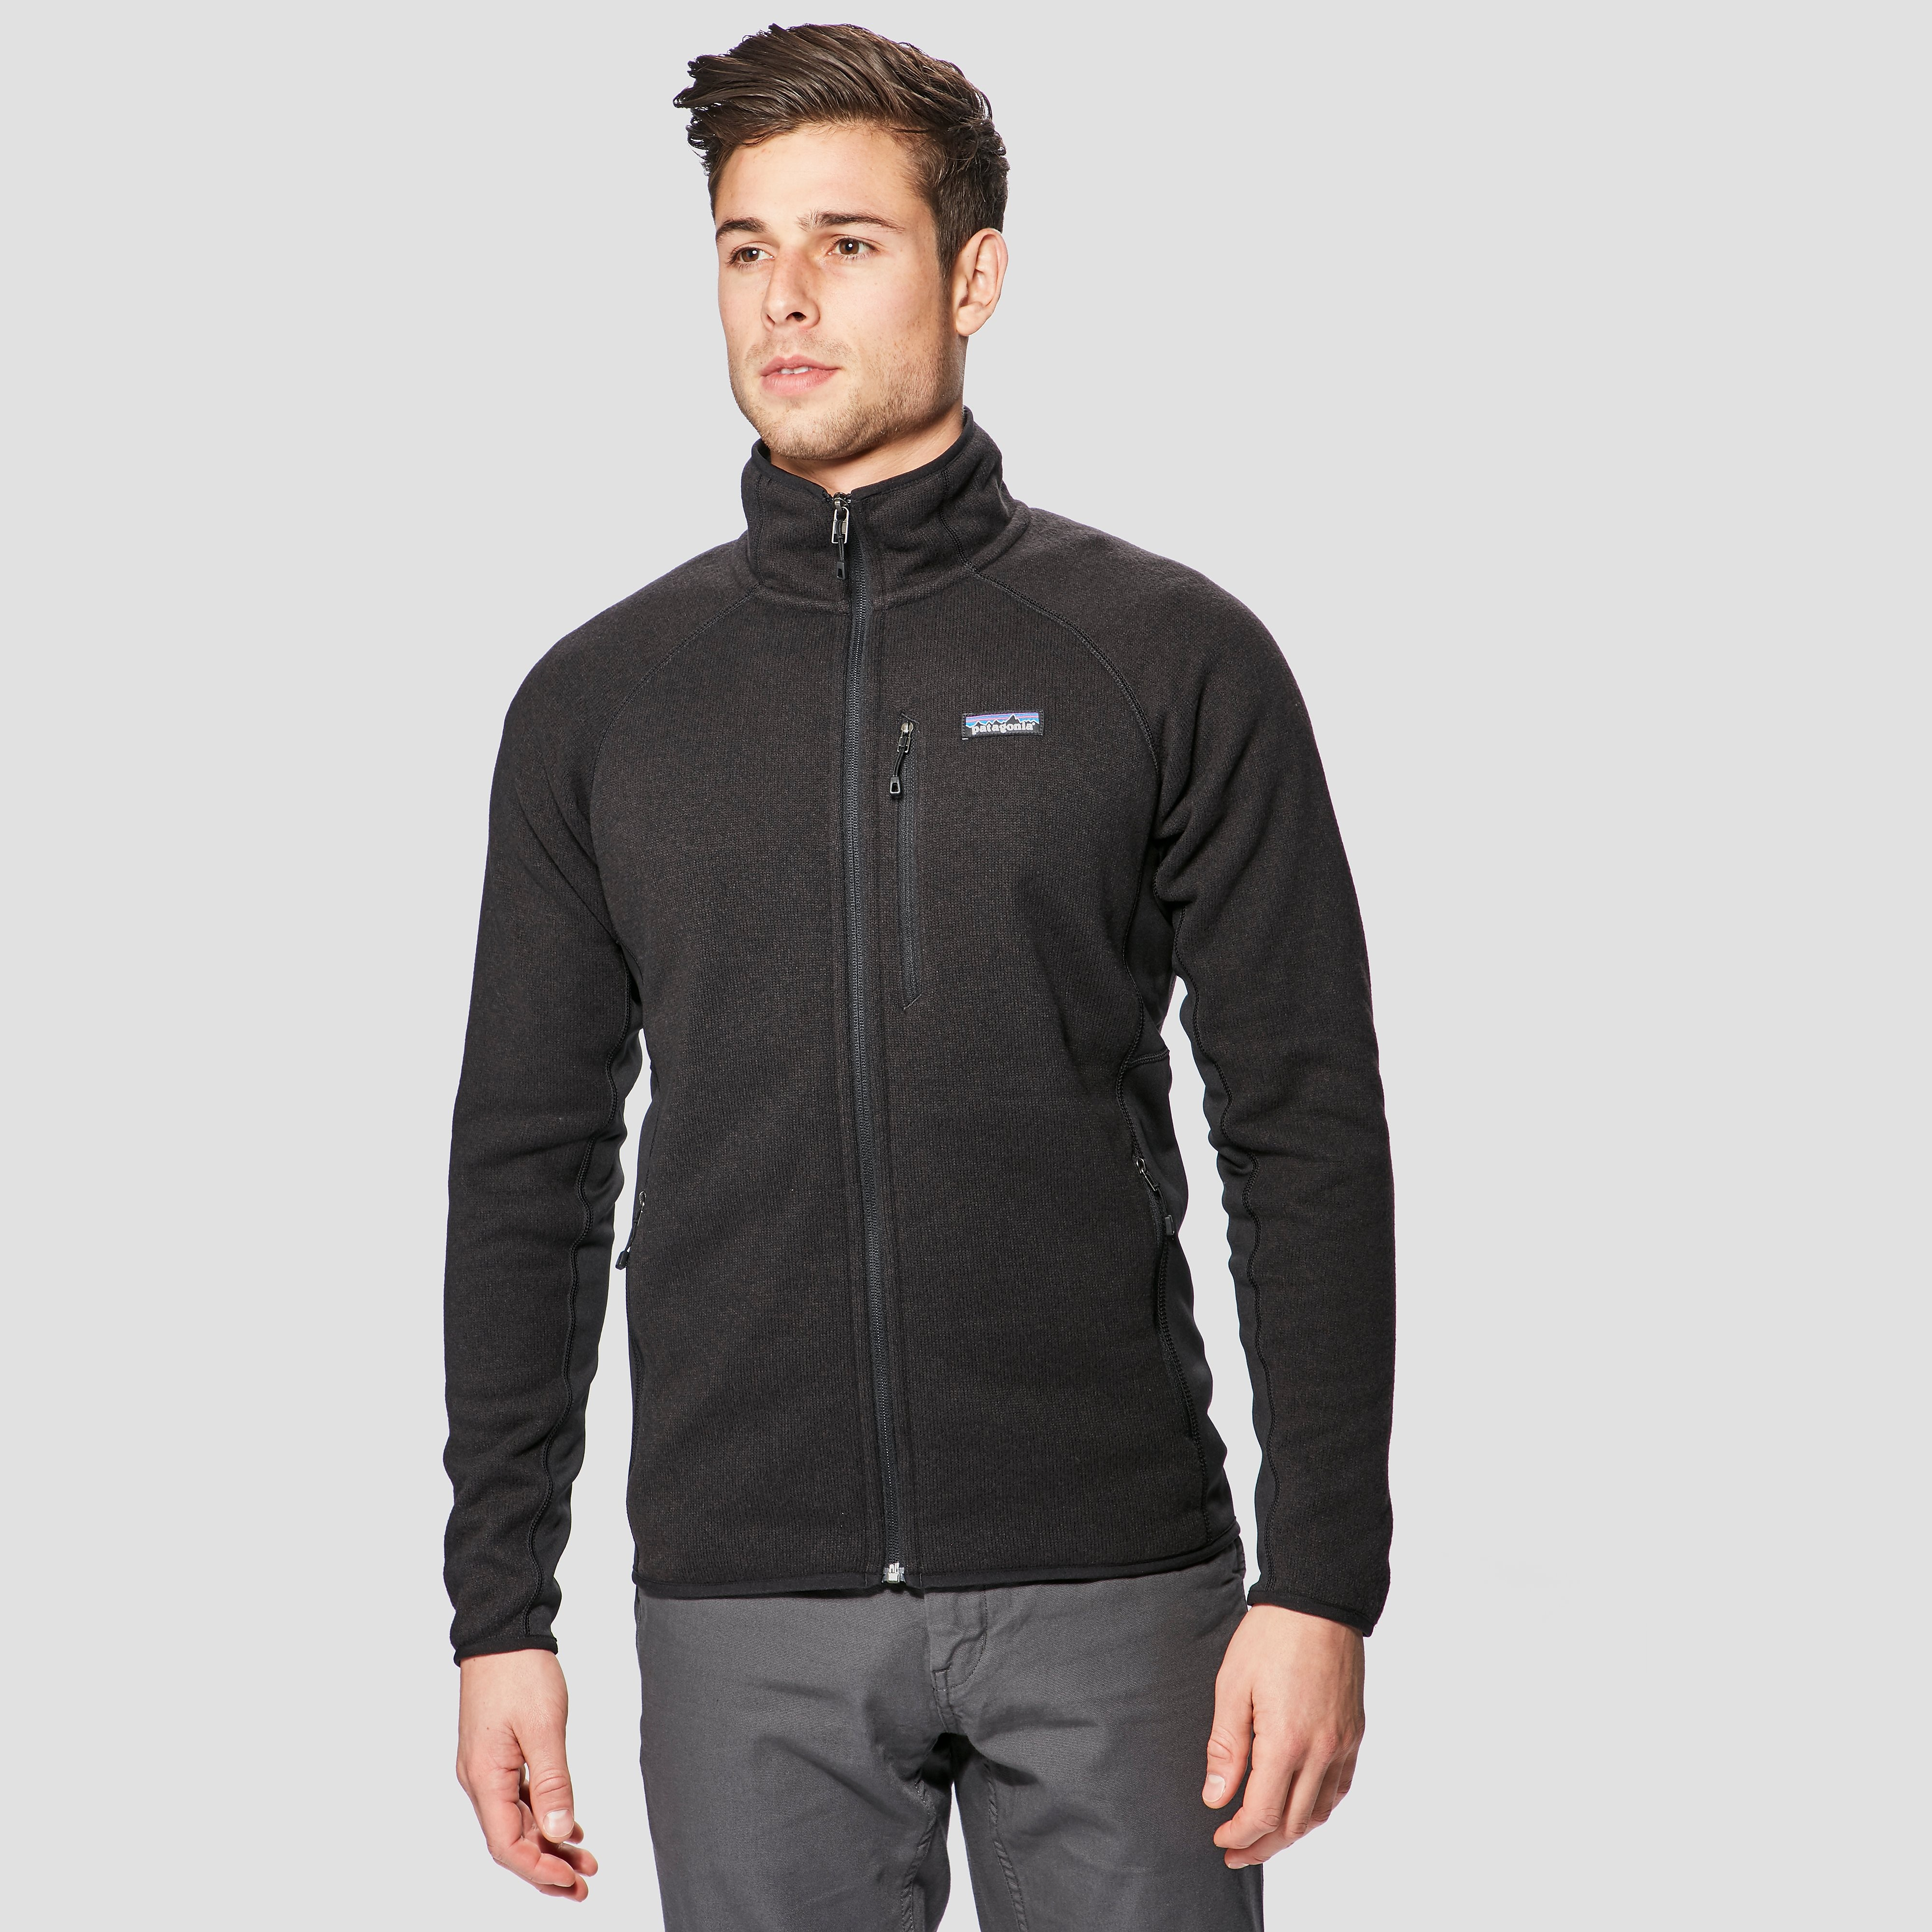 Patagonia Performance Better Men's Sweater Jacket